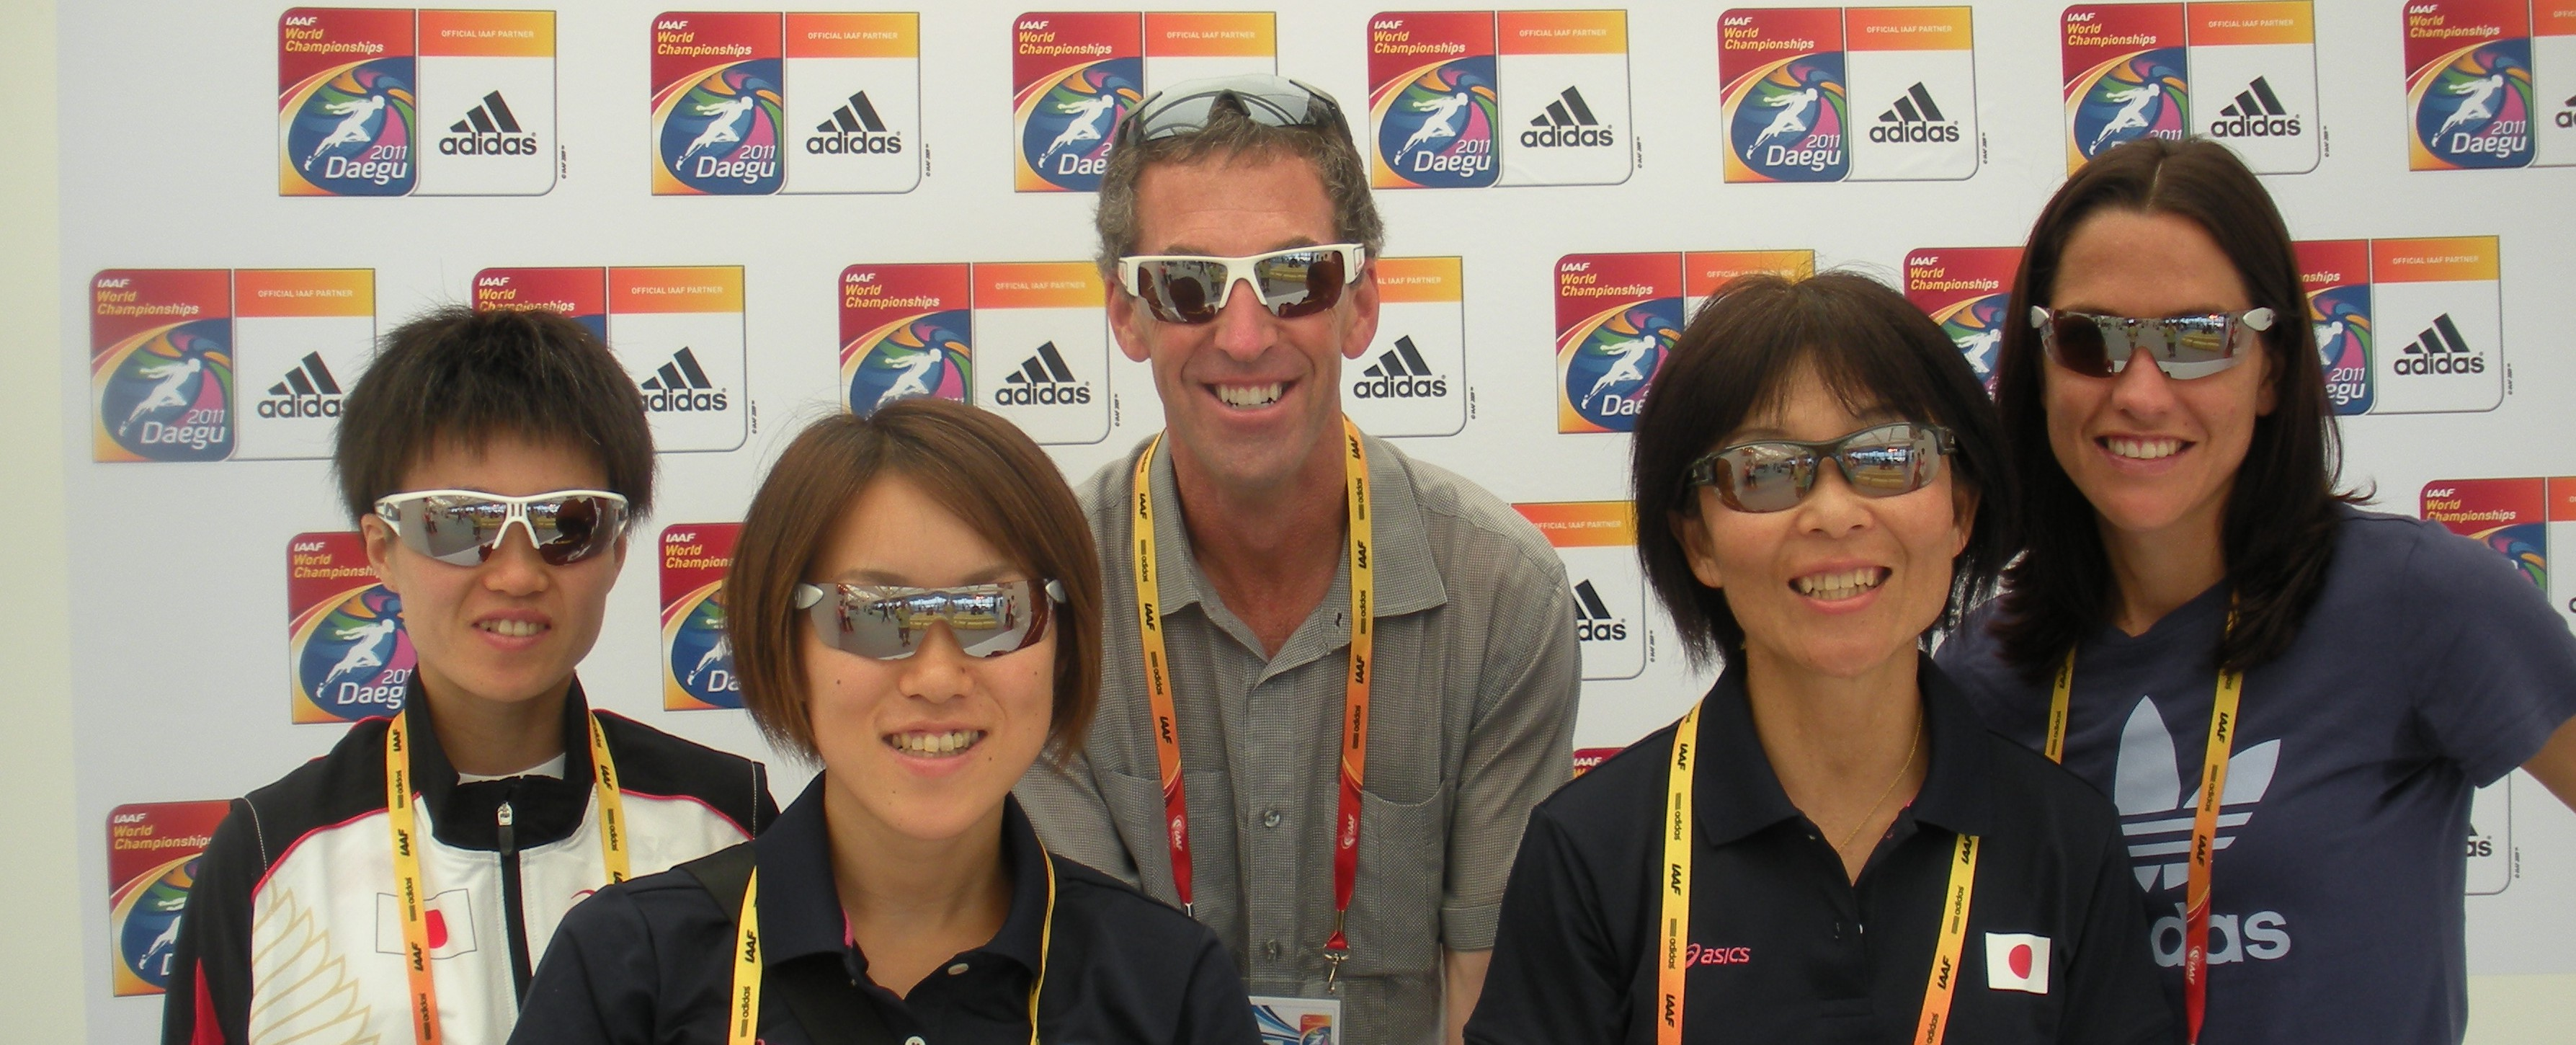 2009 Daegu adidas hospitality sunglasses